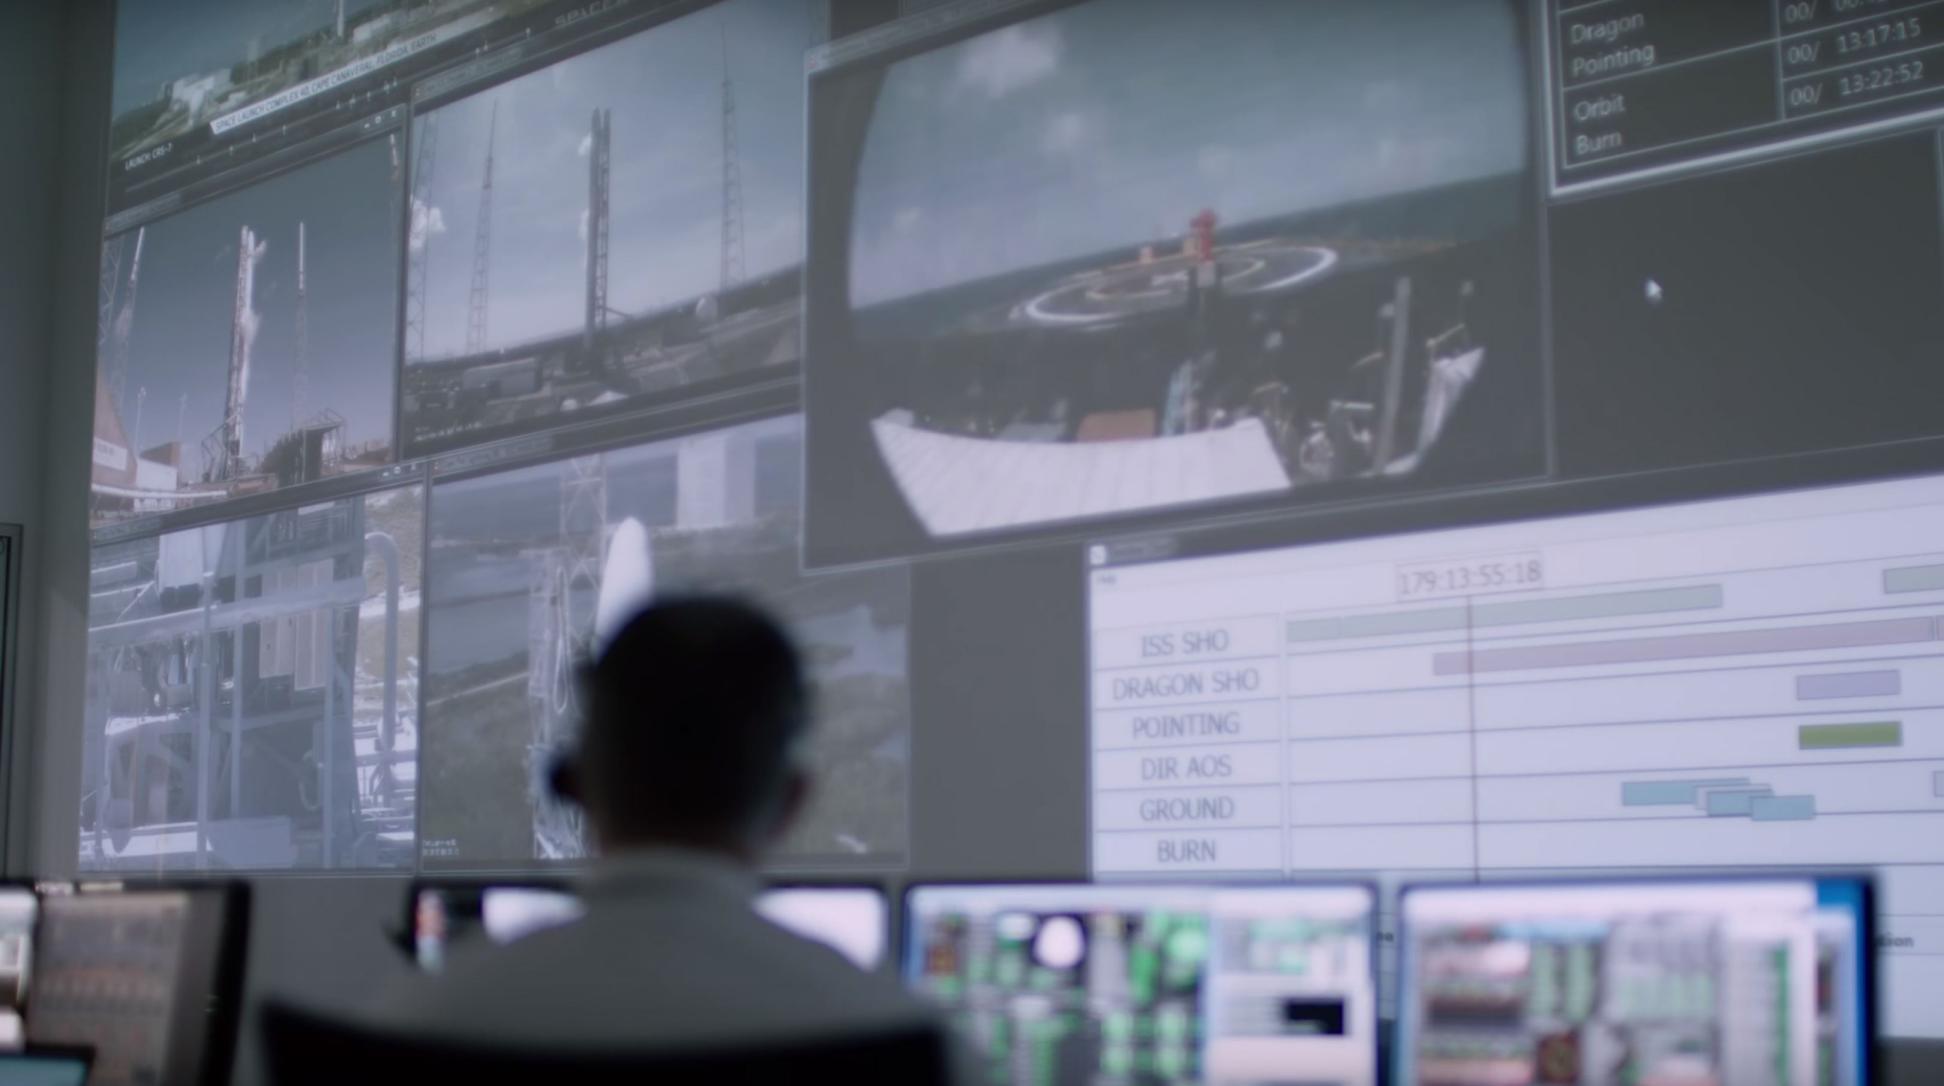 CRS-7 mission control(c)